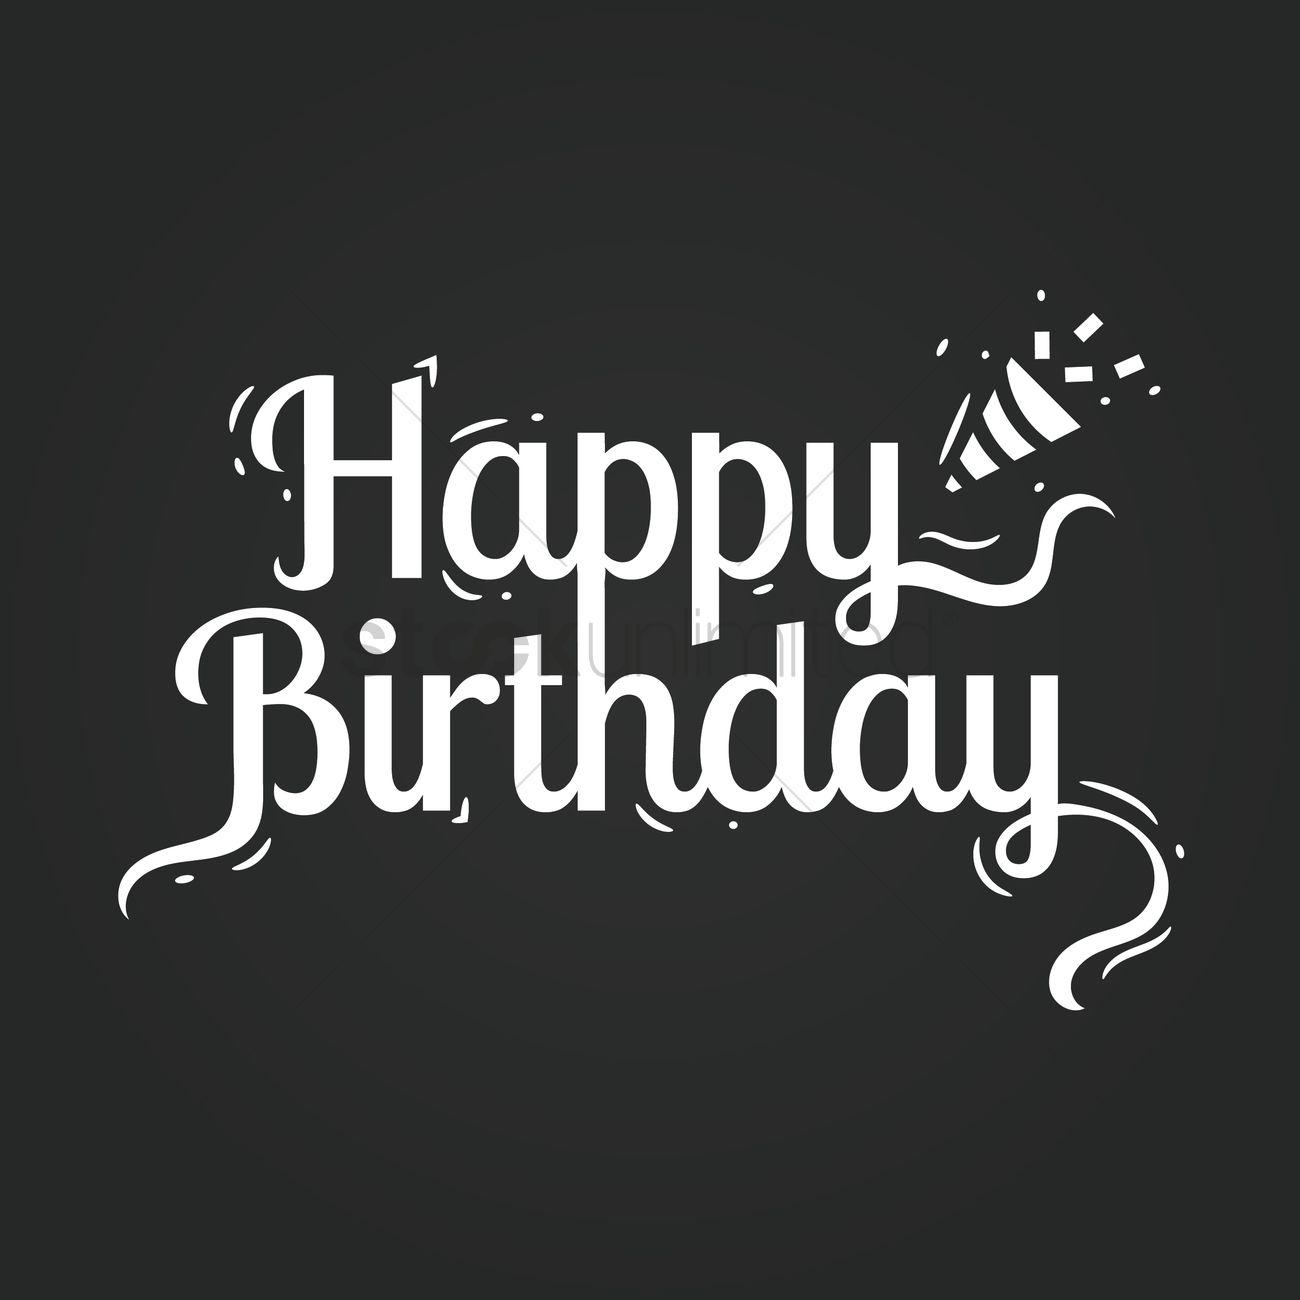 Happy Birthday Card On Blackboard Vector Image 1710078